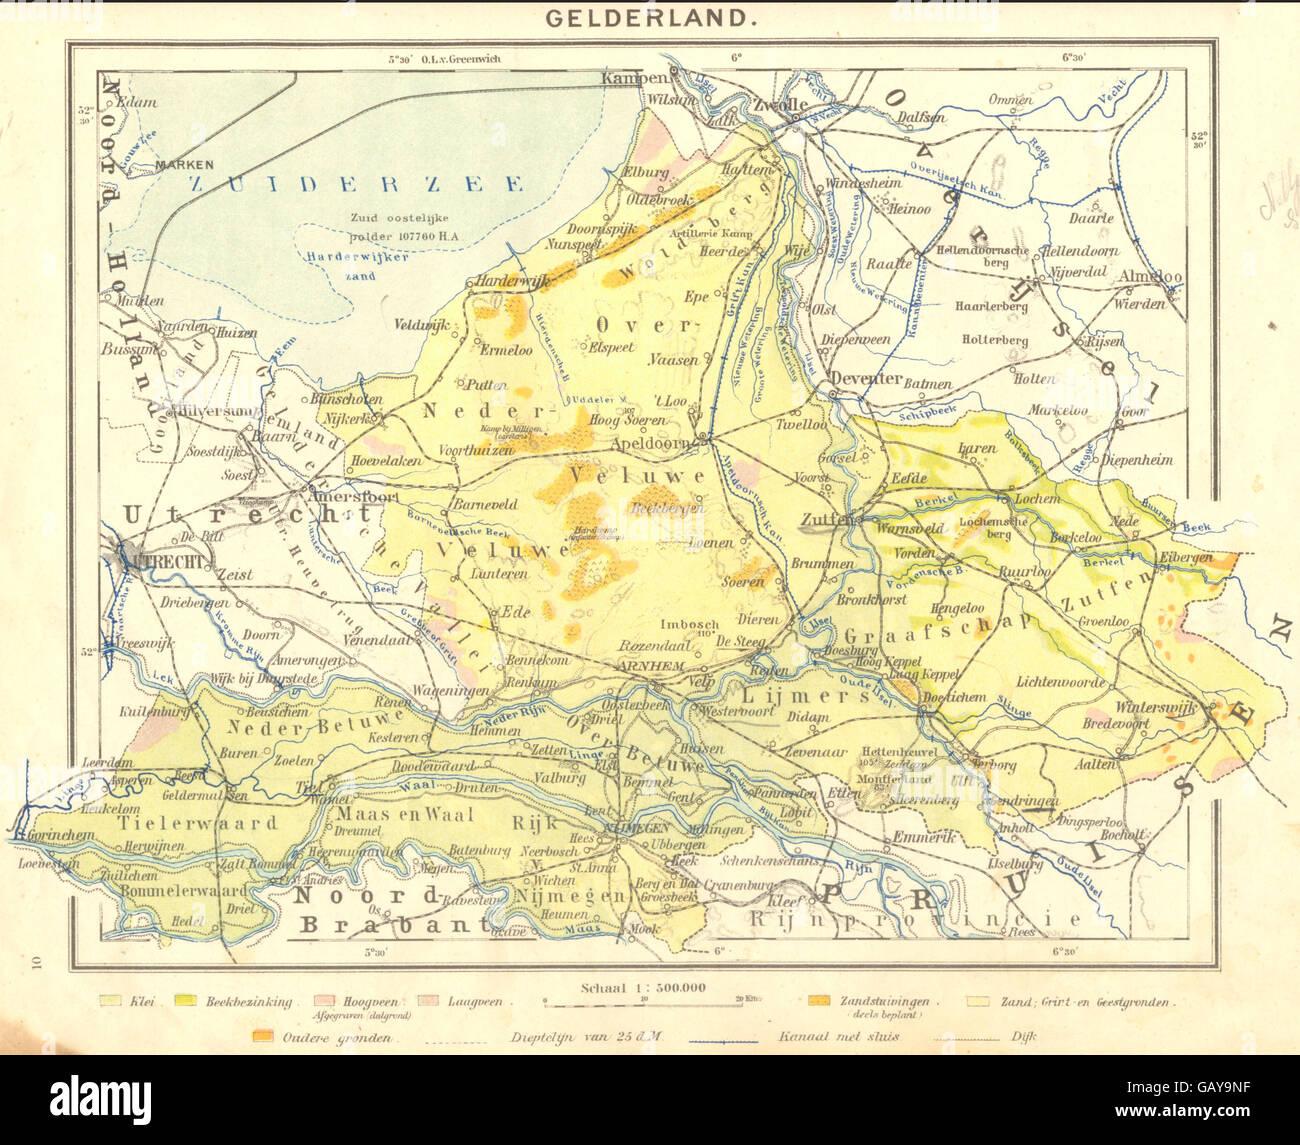 NETHERLANDS Gelderland 1922 vintage map Stock Photo Royalty Free